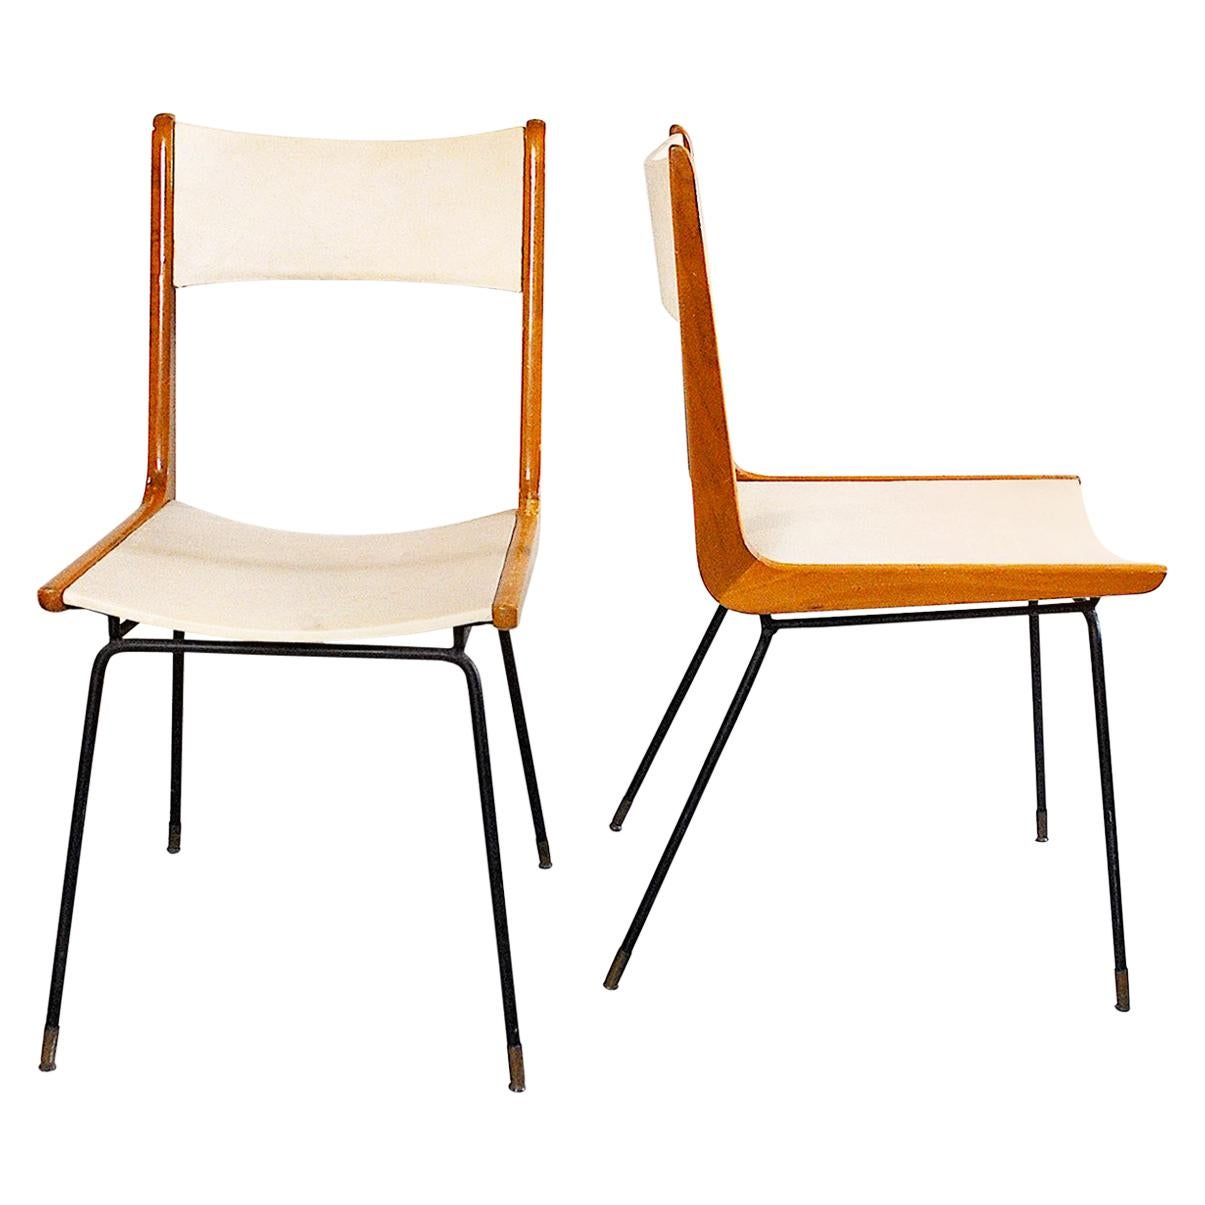 Carlo de Carli Italian Midcentury Chair